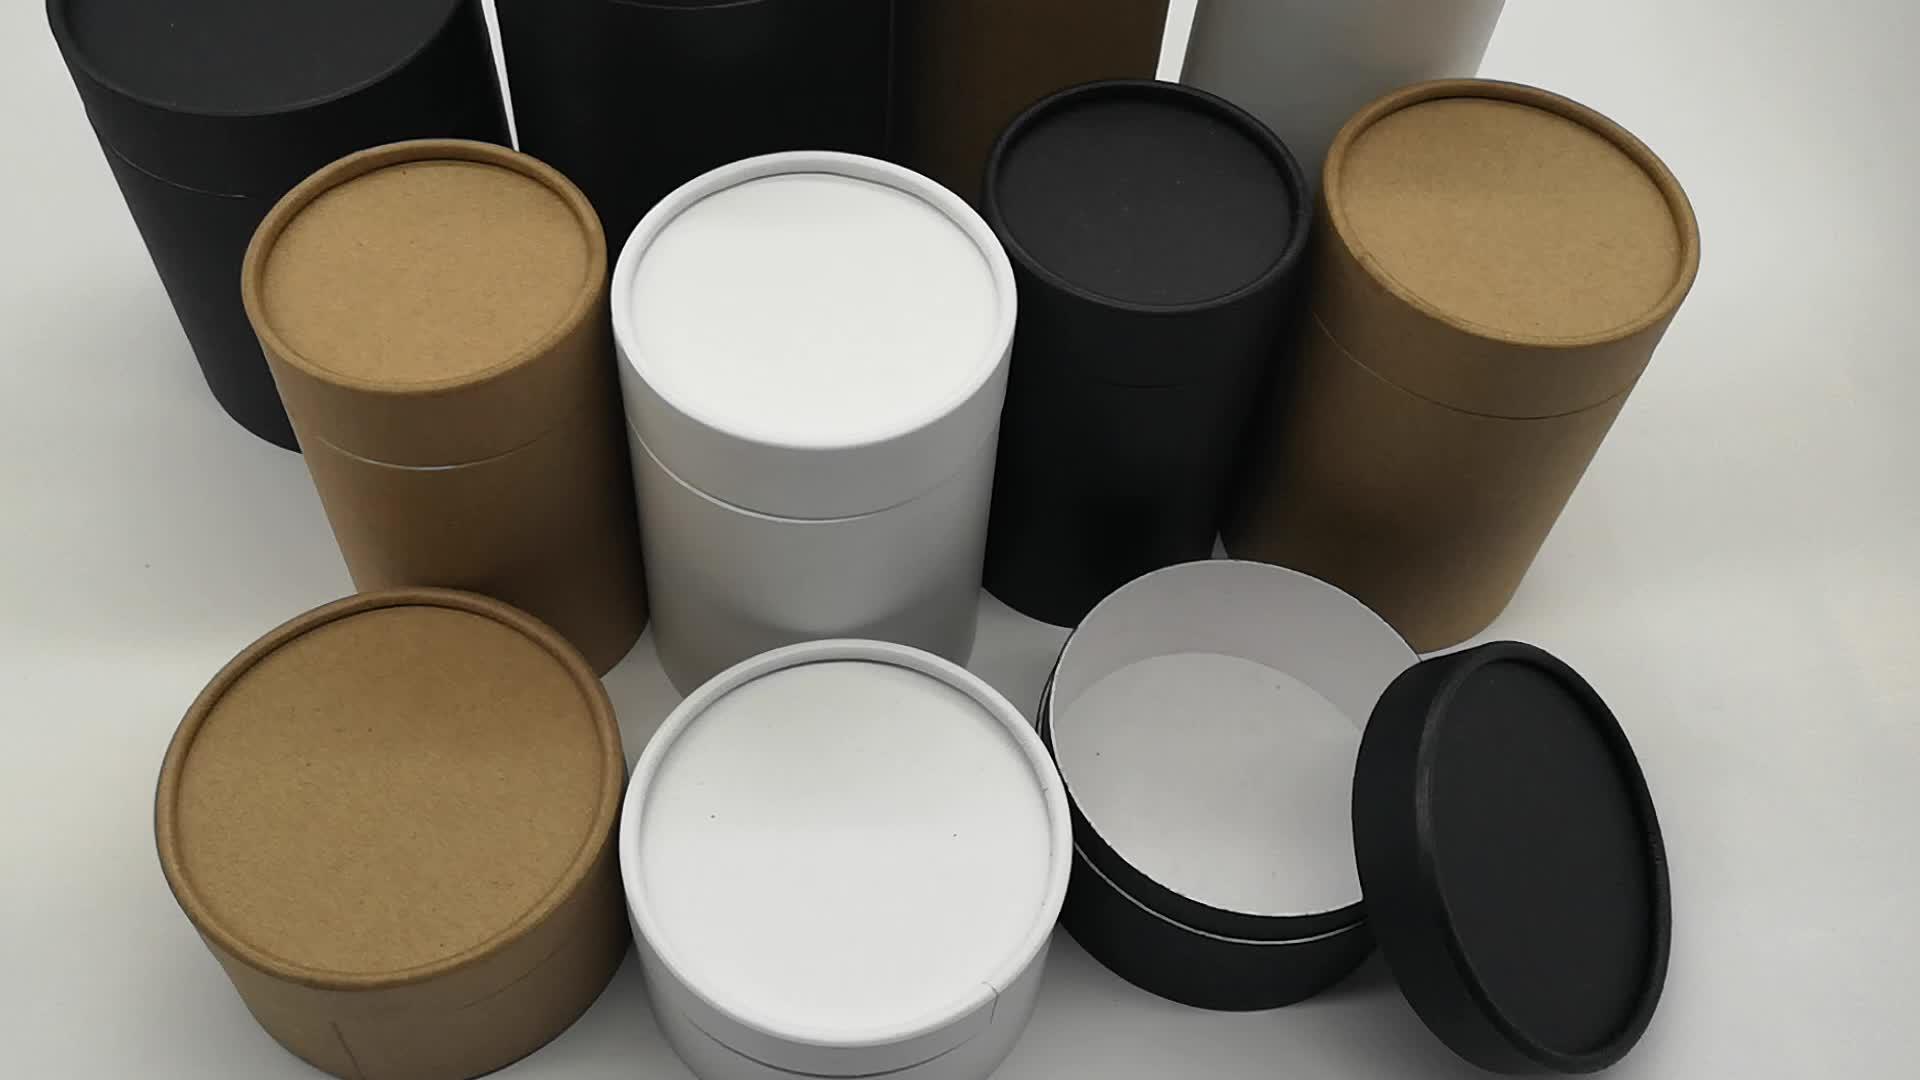 Черная крафт-бумага белая круглая коробка картонная банка бутылка контейнер упаковочная трубка